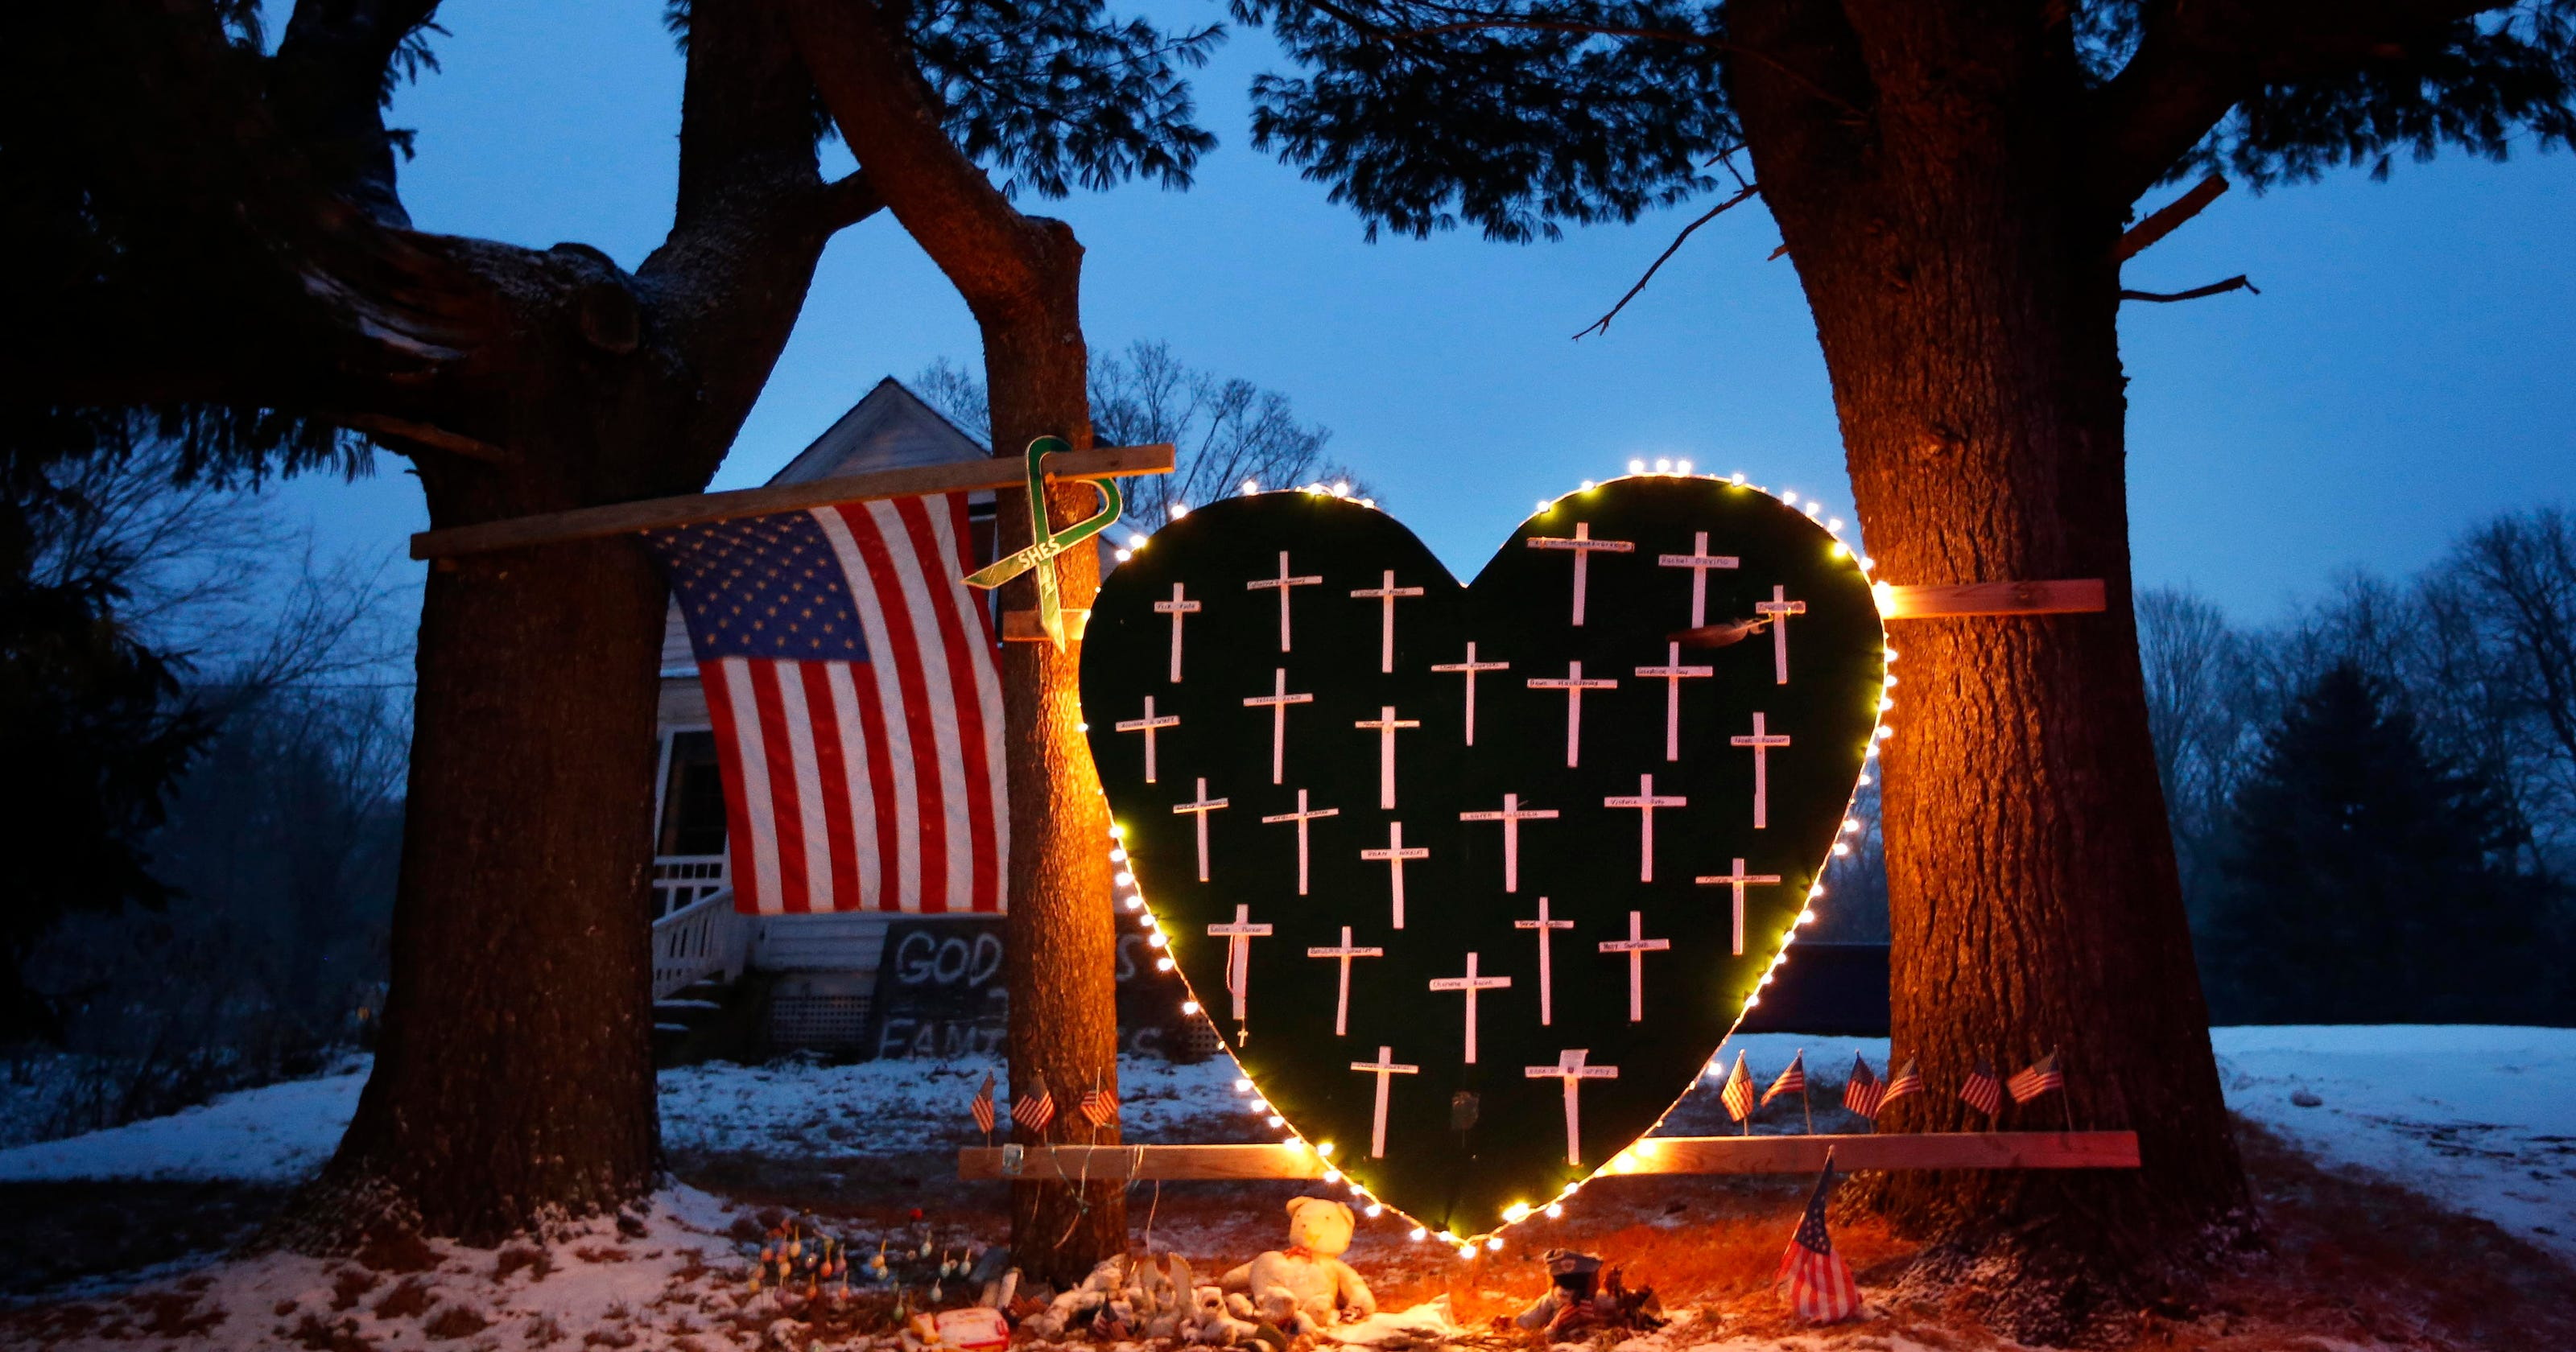 Sandy Hook: FBI documents have disturbing details on killer